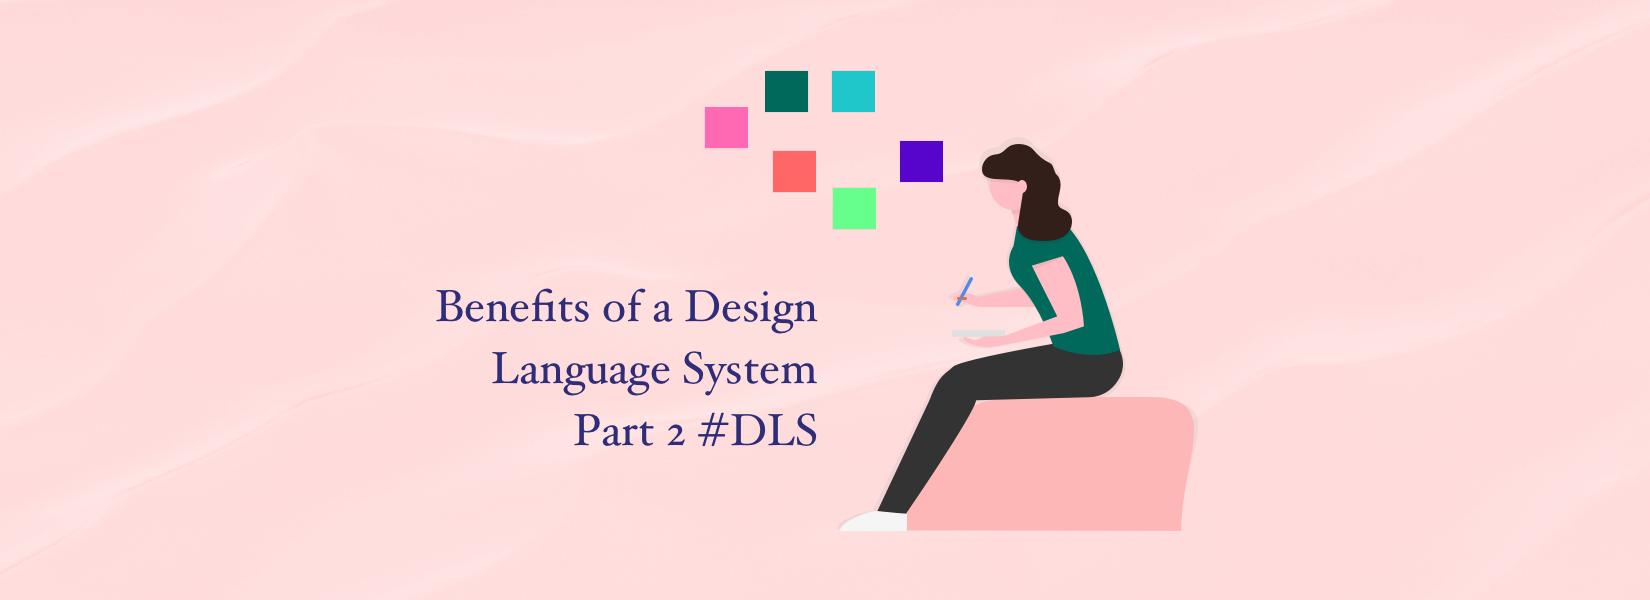 Benefits of a Design Language System Part 2 #DLS